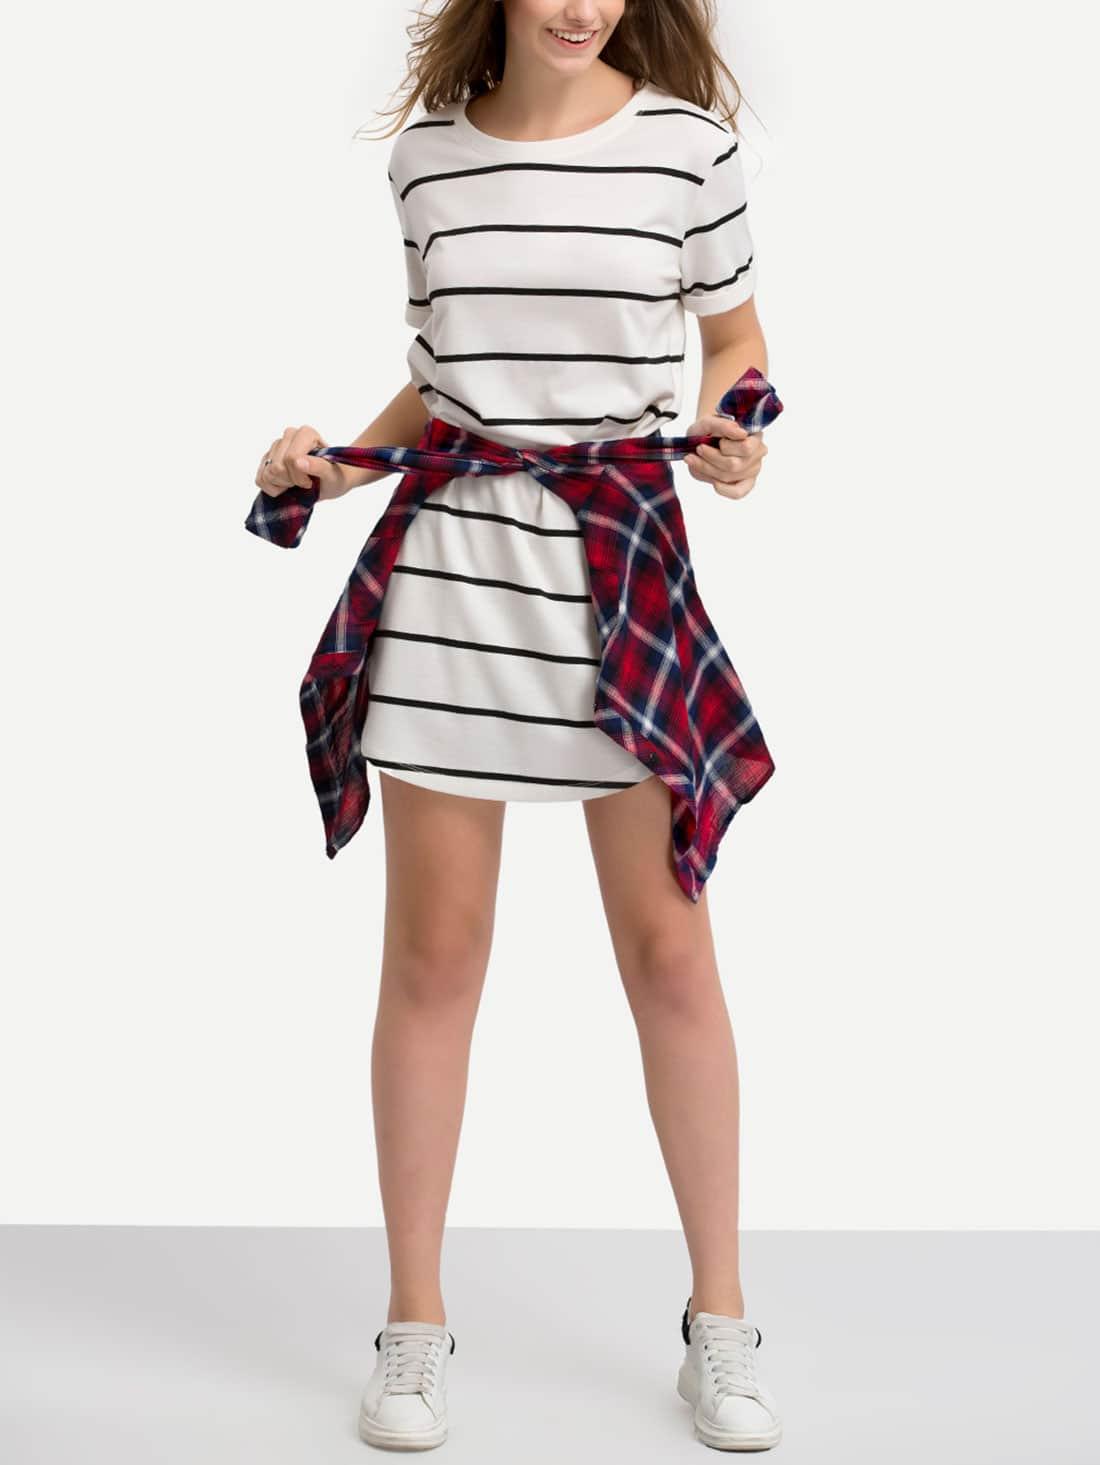 Black white short sleeve striped t shirt dress shein for Black and white short sleeve shirts